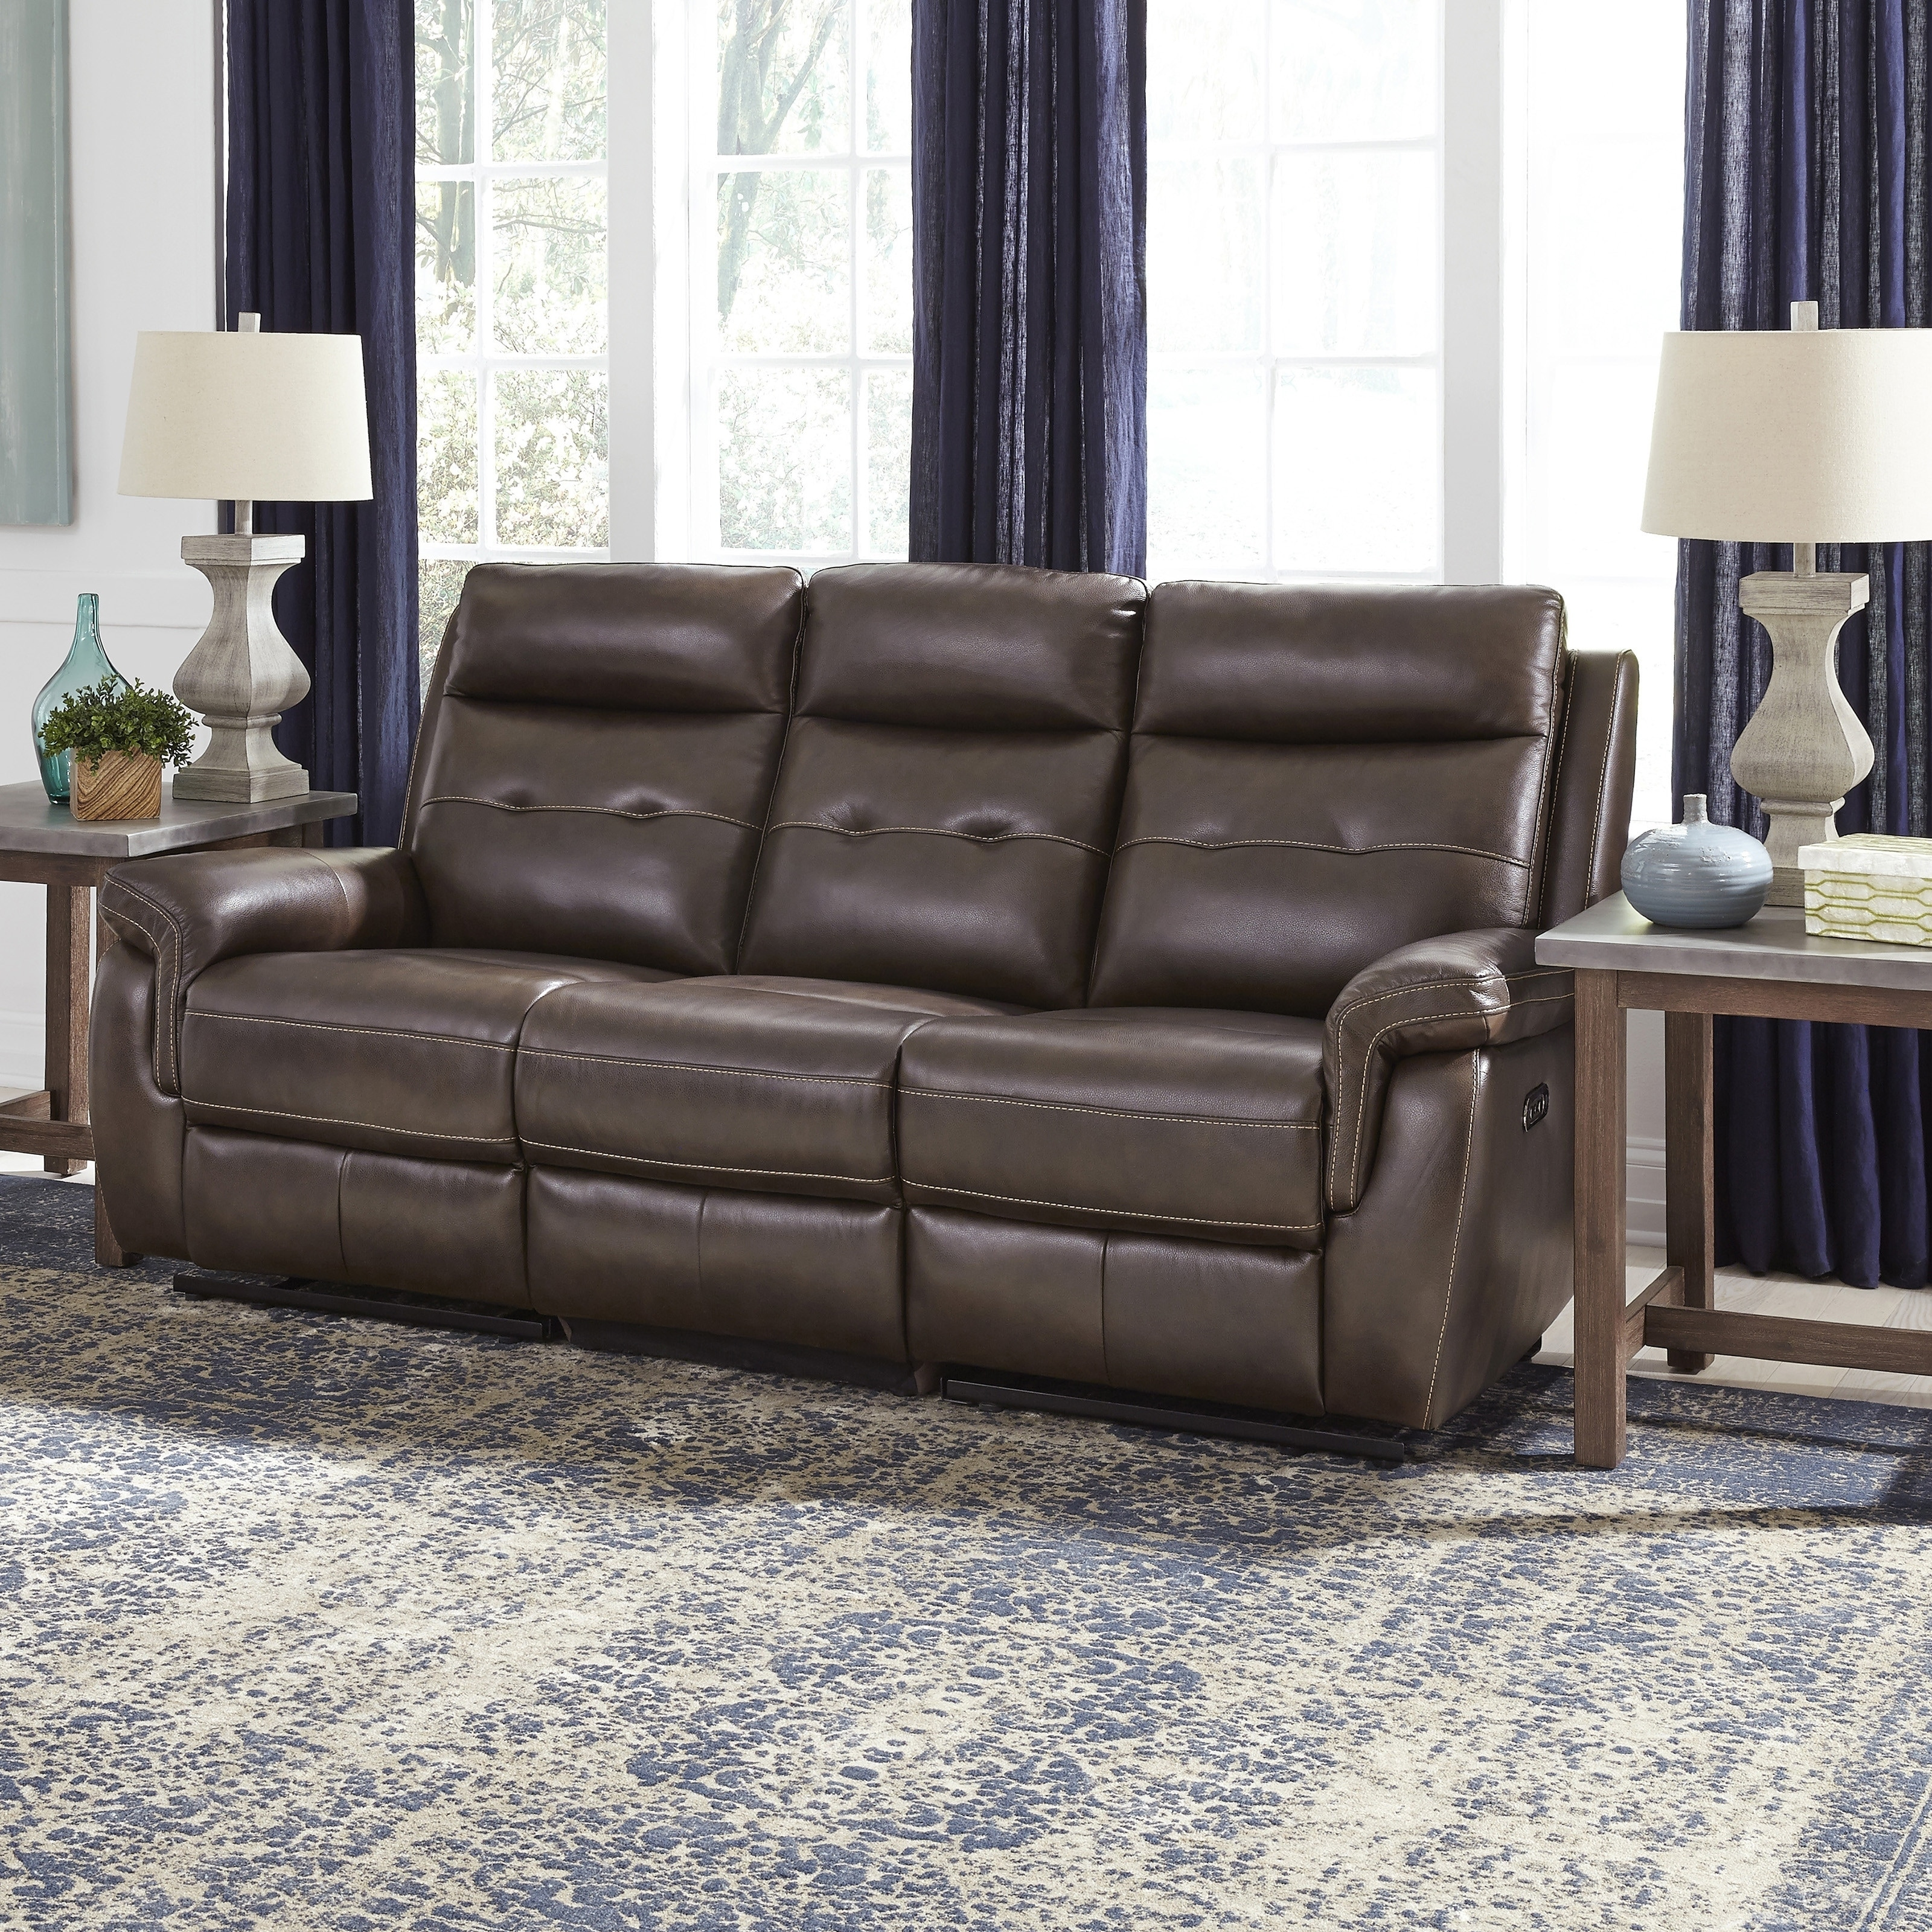 Flexsteel Lux Leather